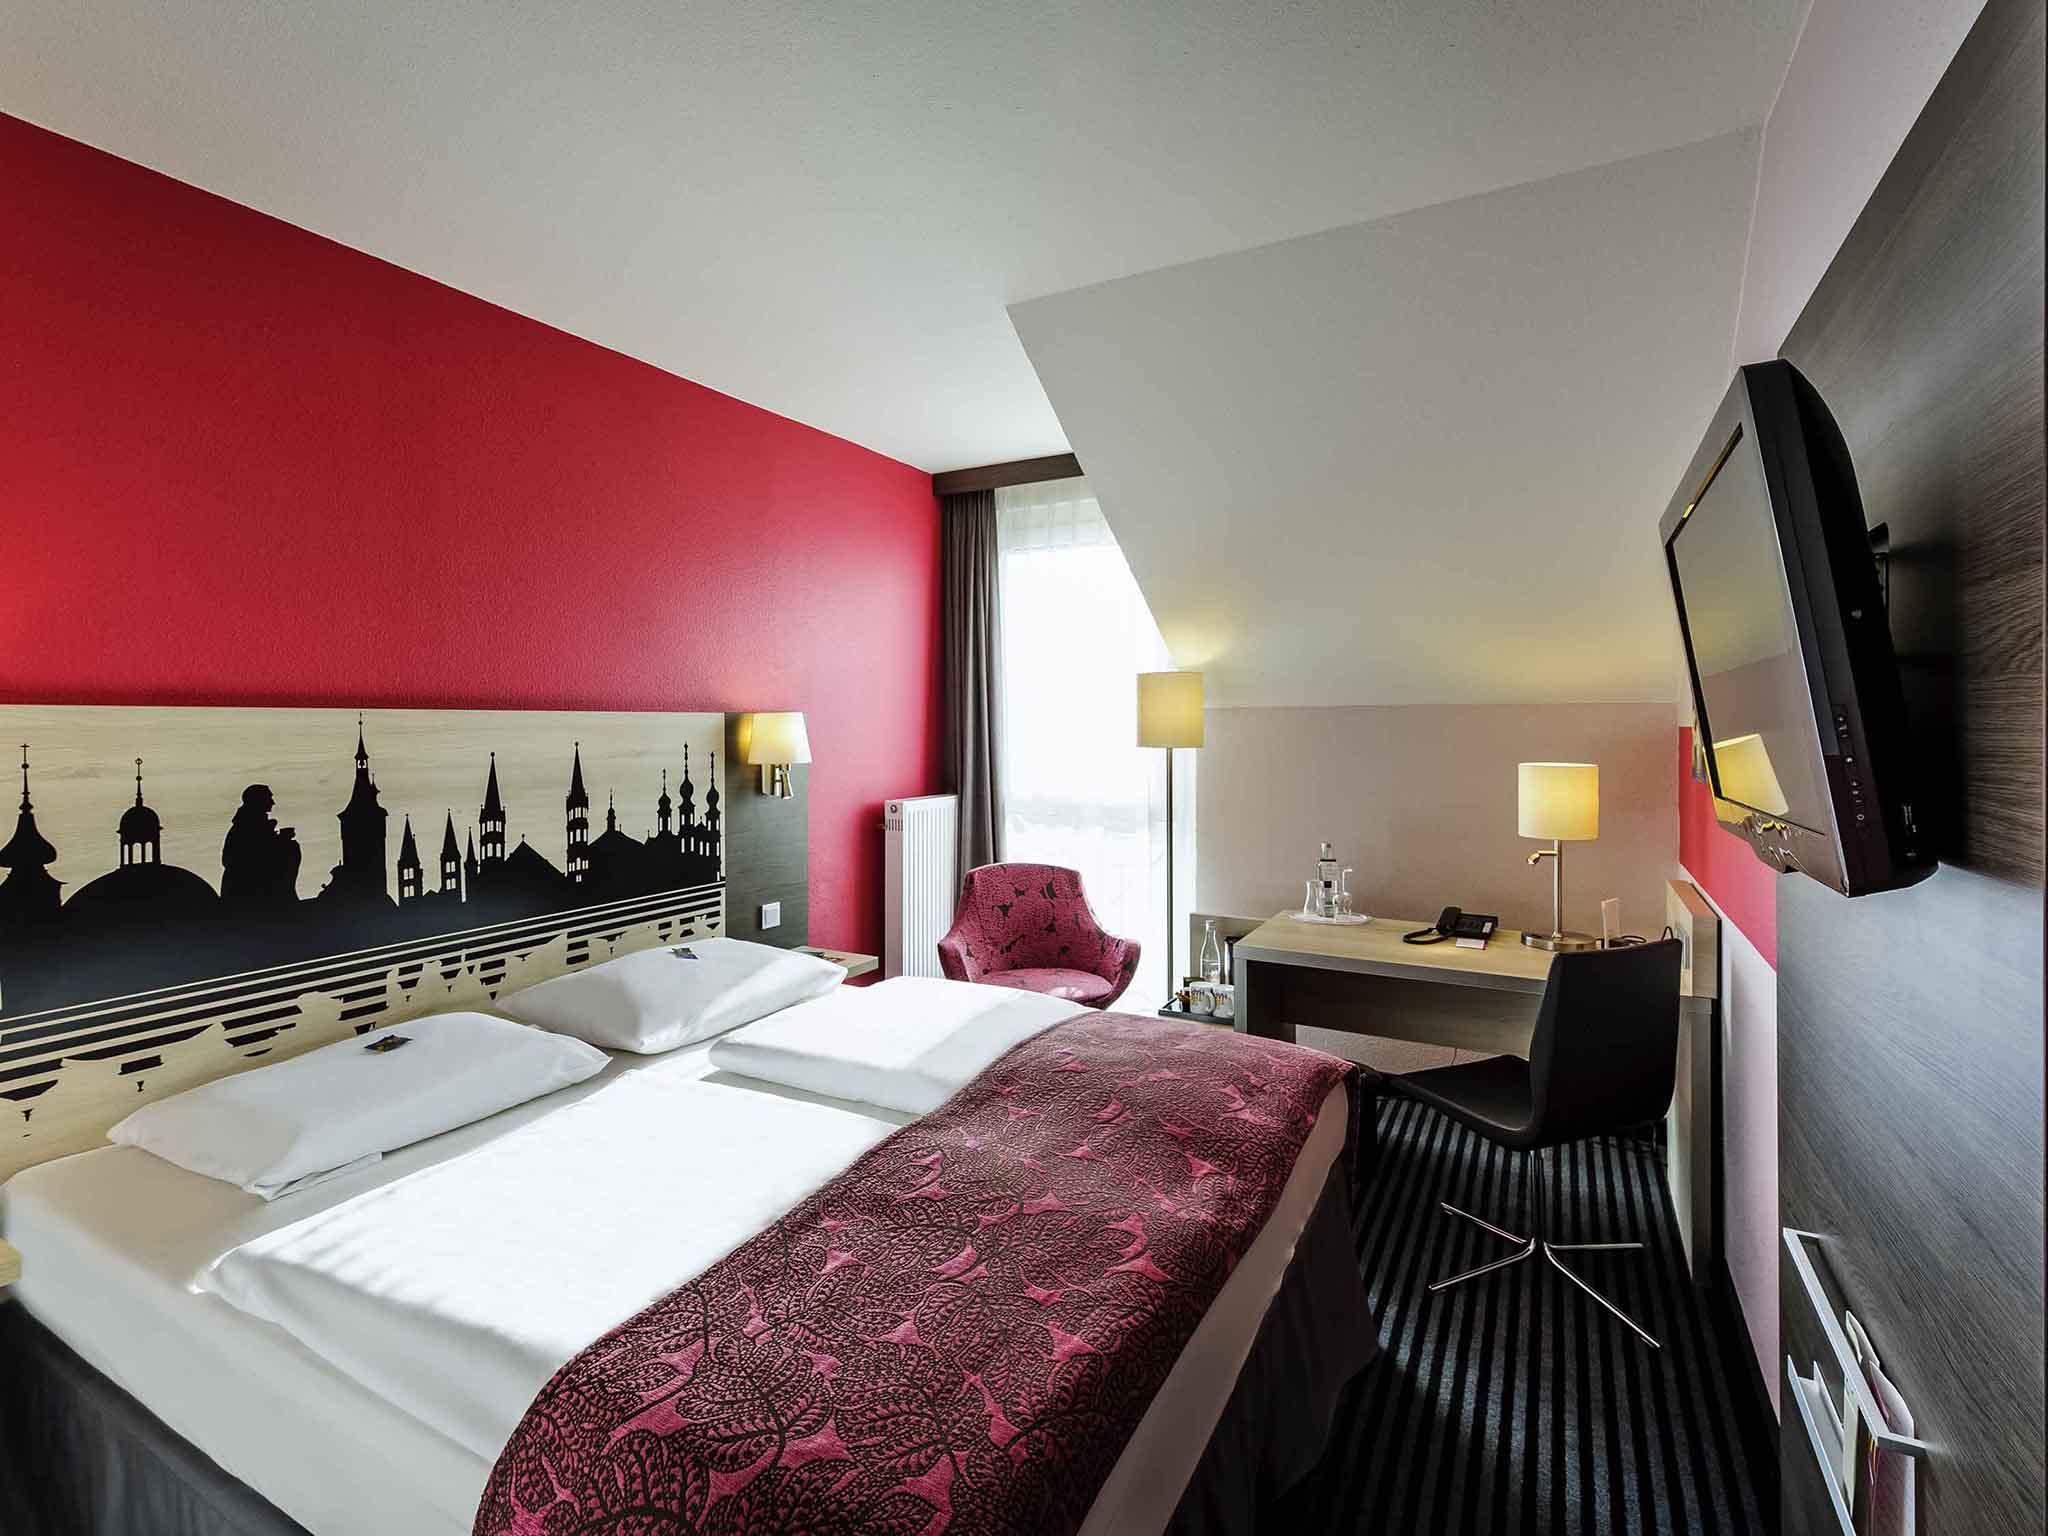 Hotel in w rzburg mercure hotel w rzburg am mainufer for Hotels in wuerzburg